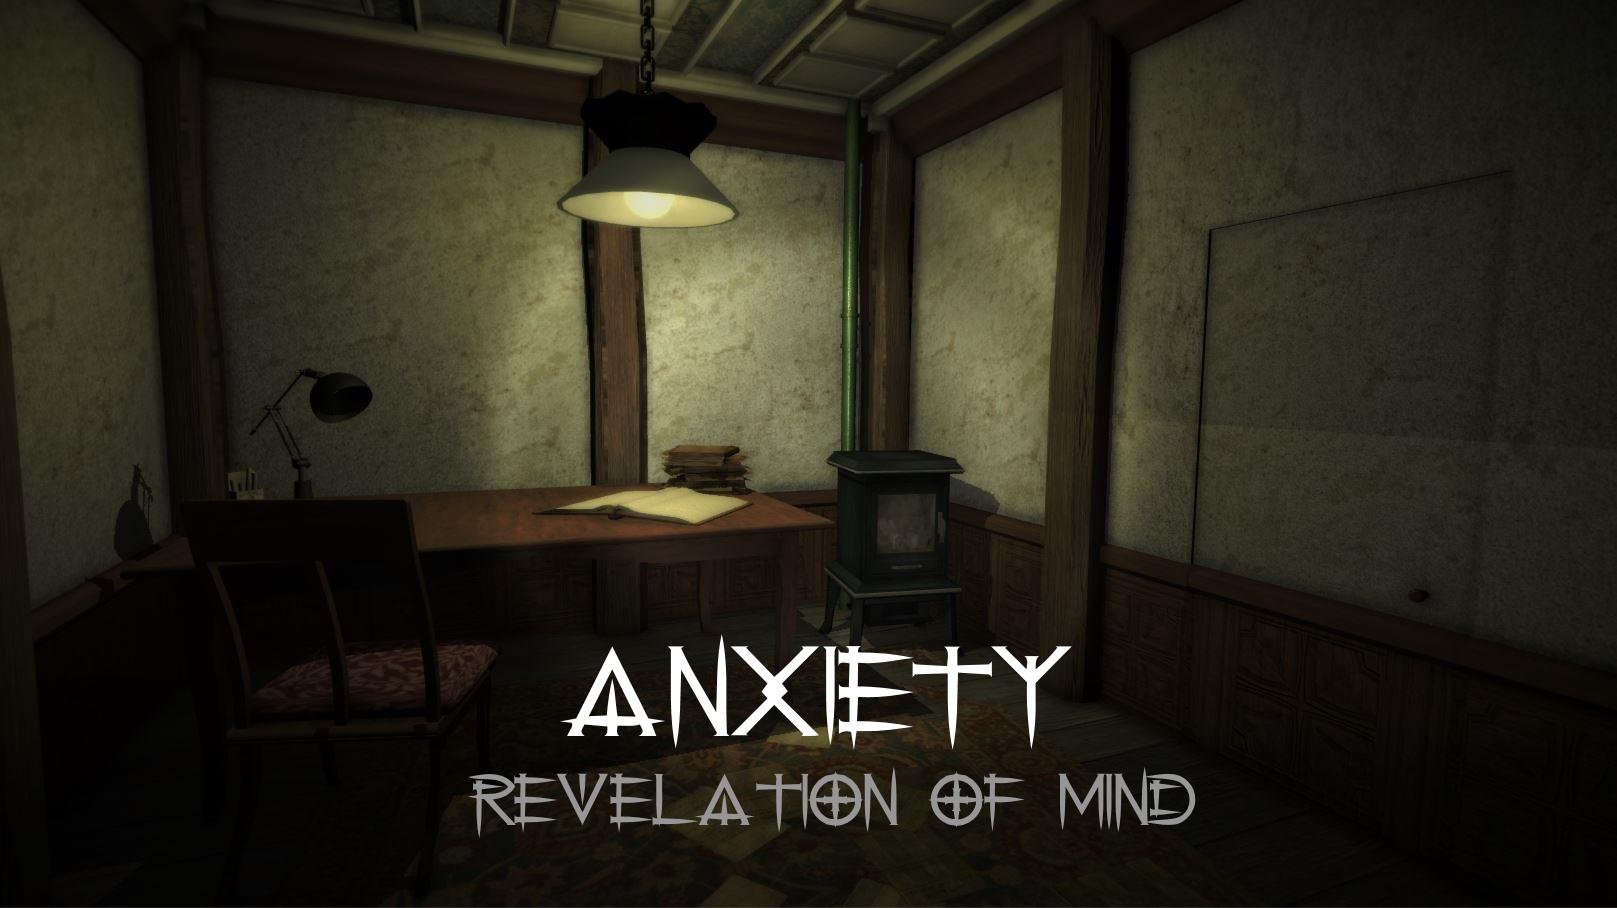 Anxiety: Revelation of Mind